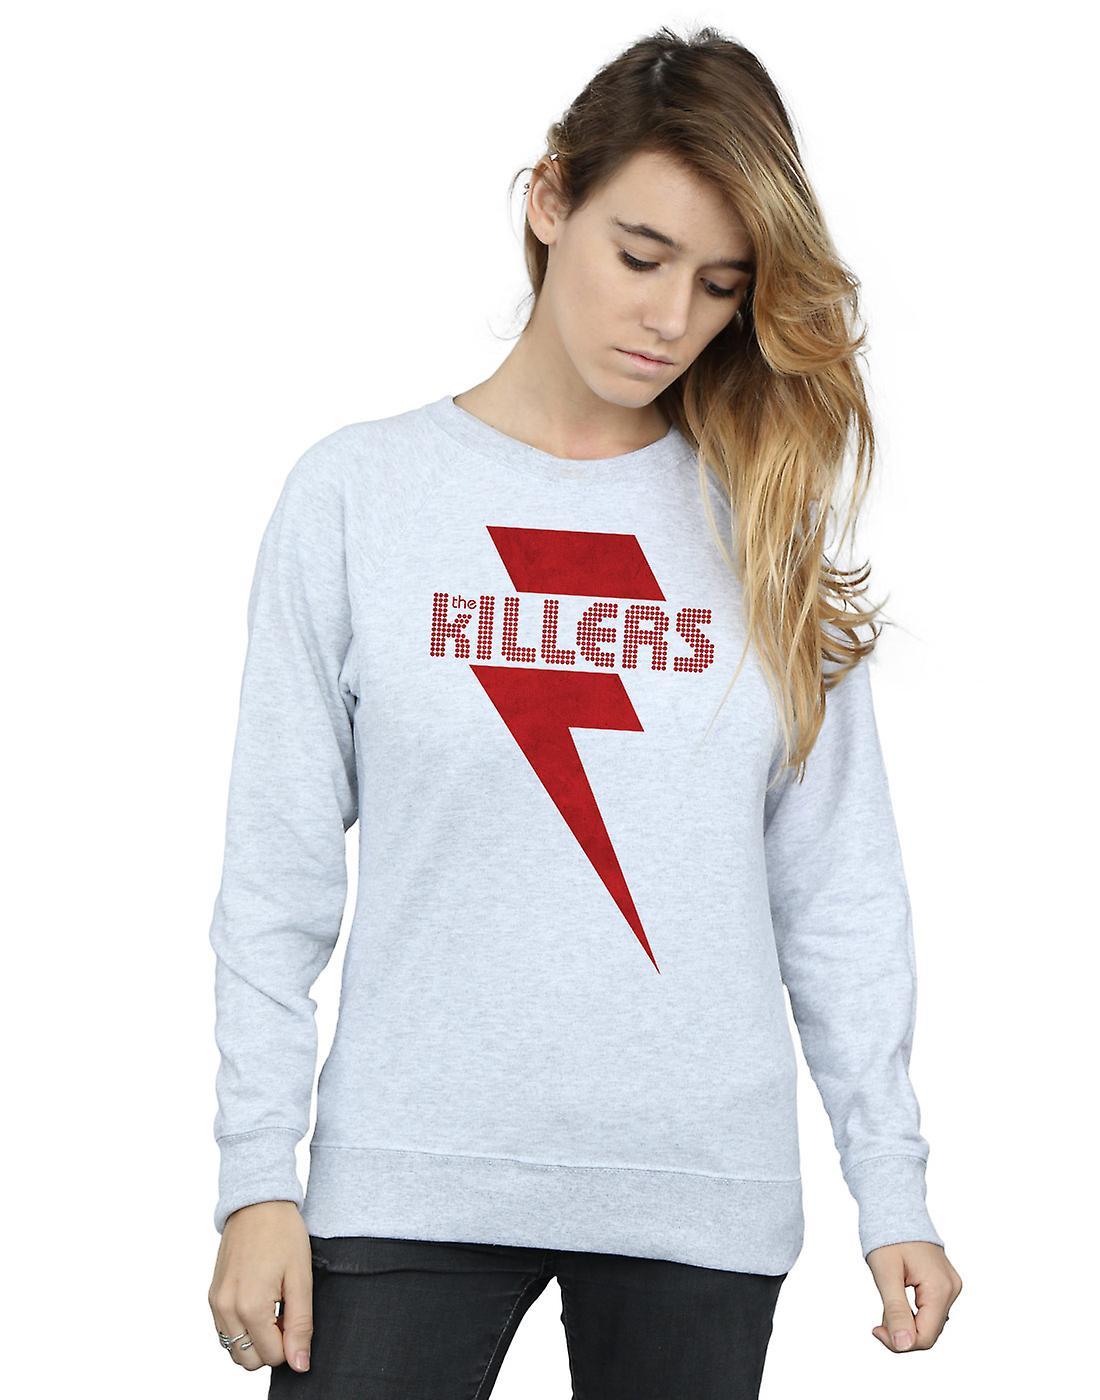 The Killers Women's Red Bolt Sweatshirt